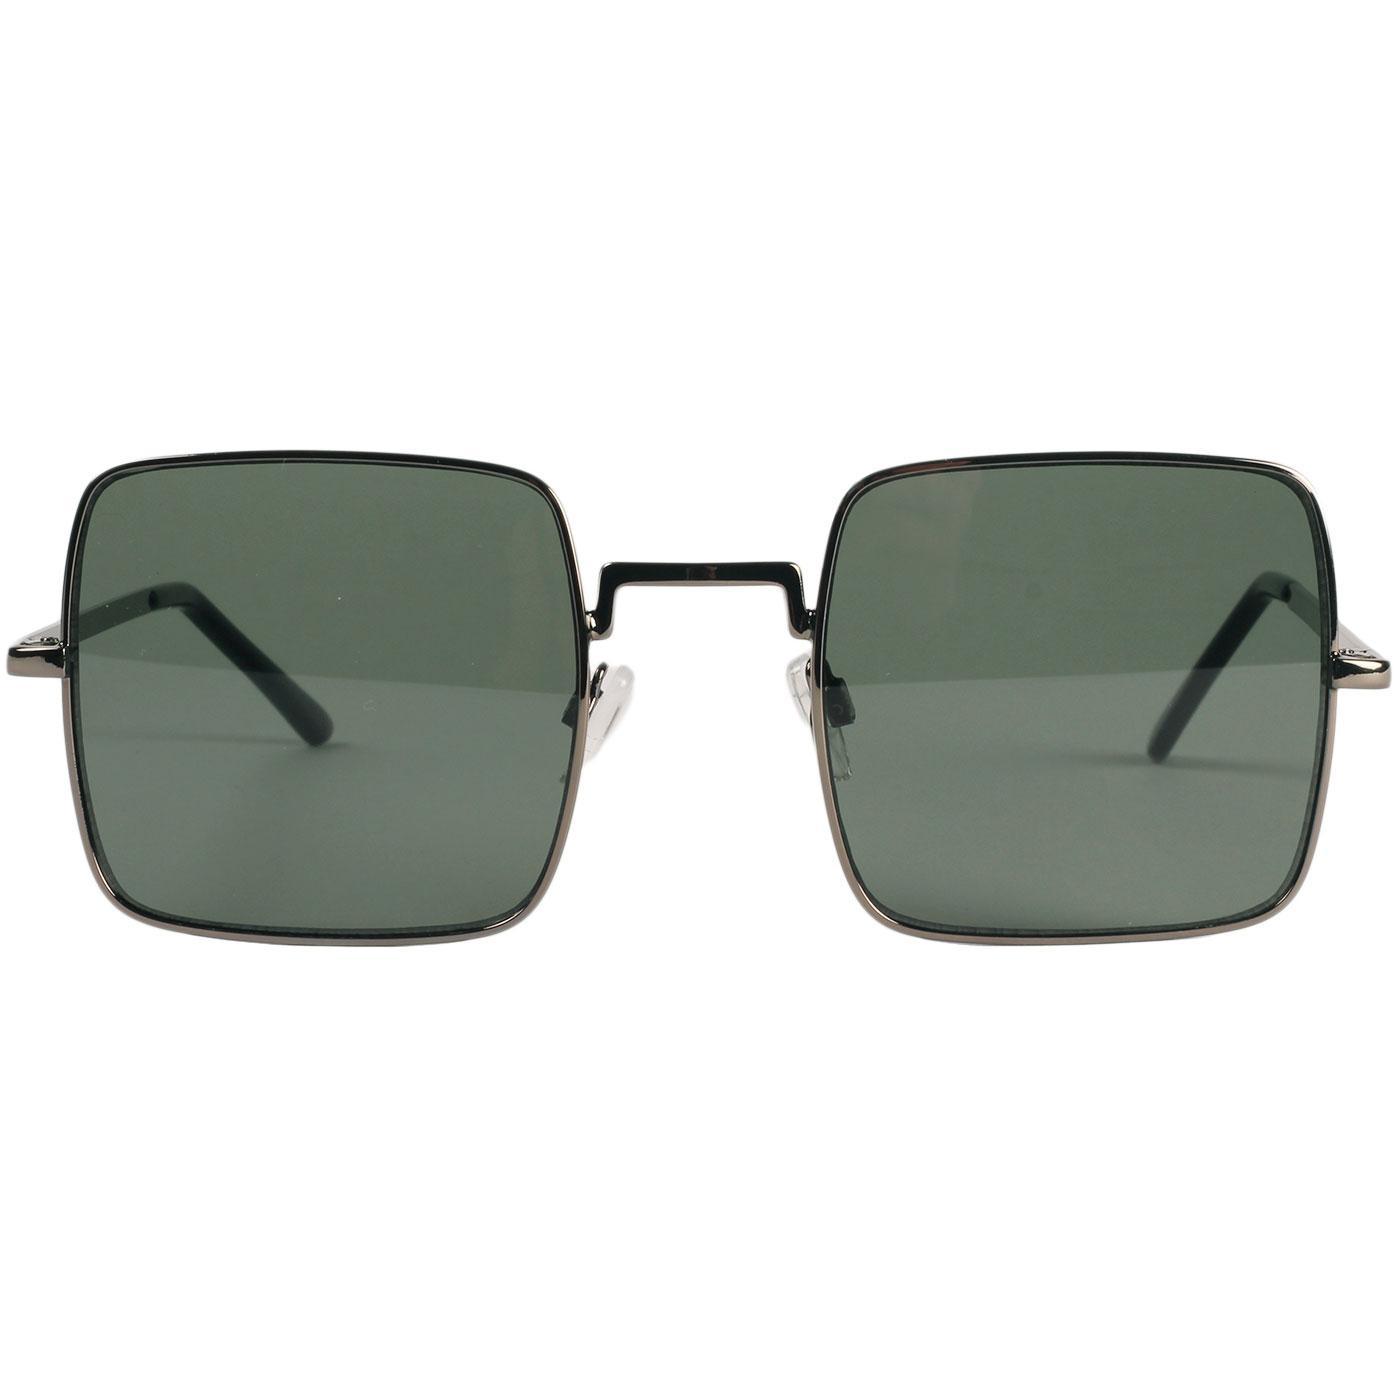 Harrison MADCAP ENGLAND 60s Square Sunglasses (G)